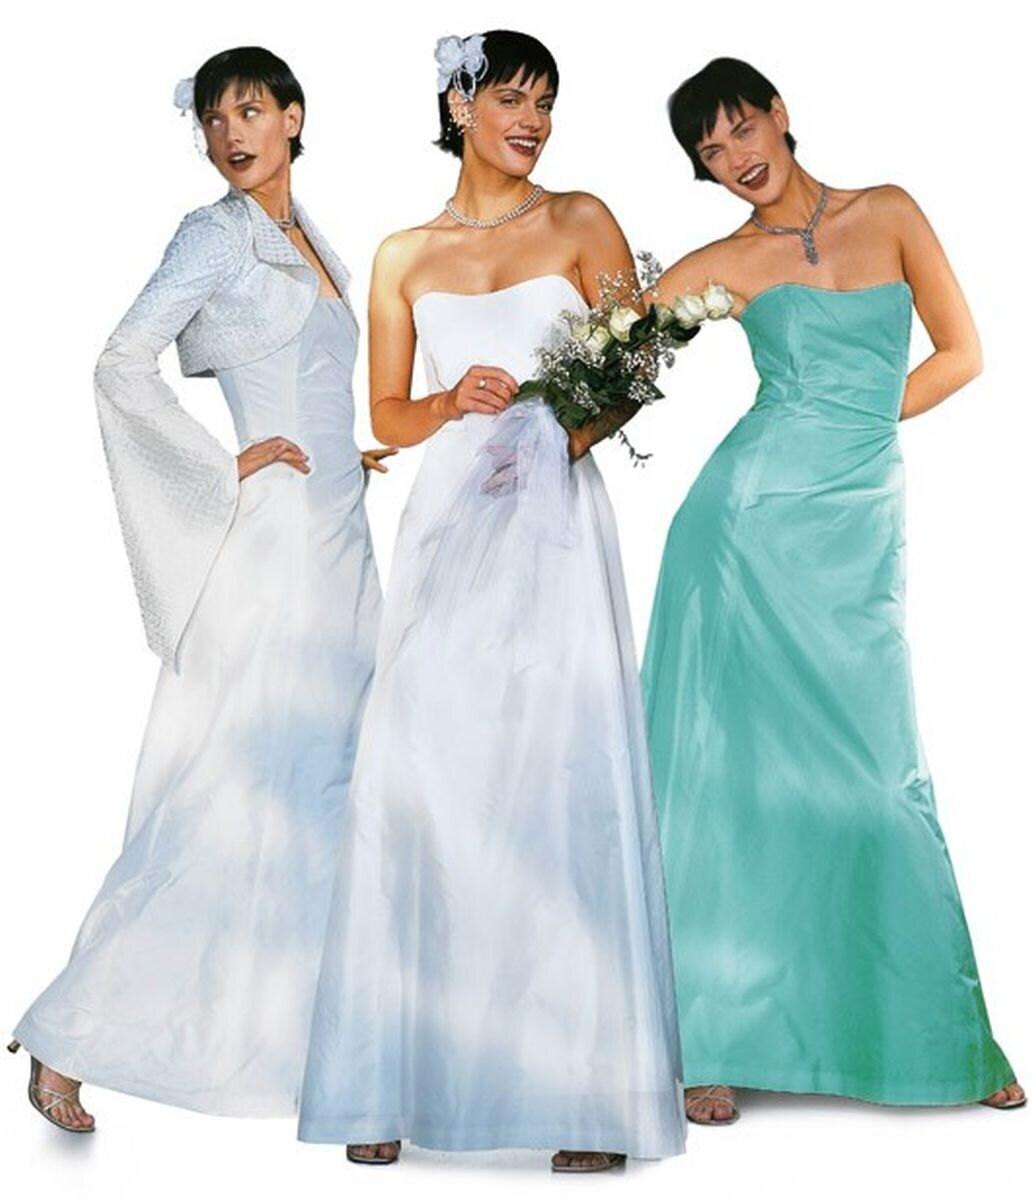 Burda 8320 Strapless Wedding Dress & Jacket Sewing Pattern Sizes 10 ...